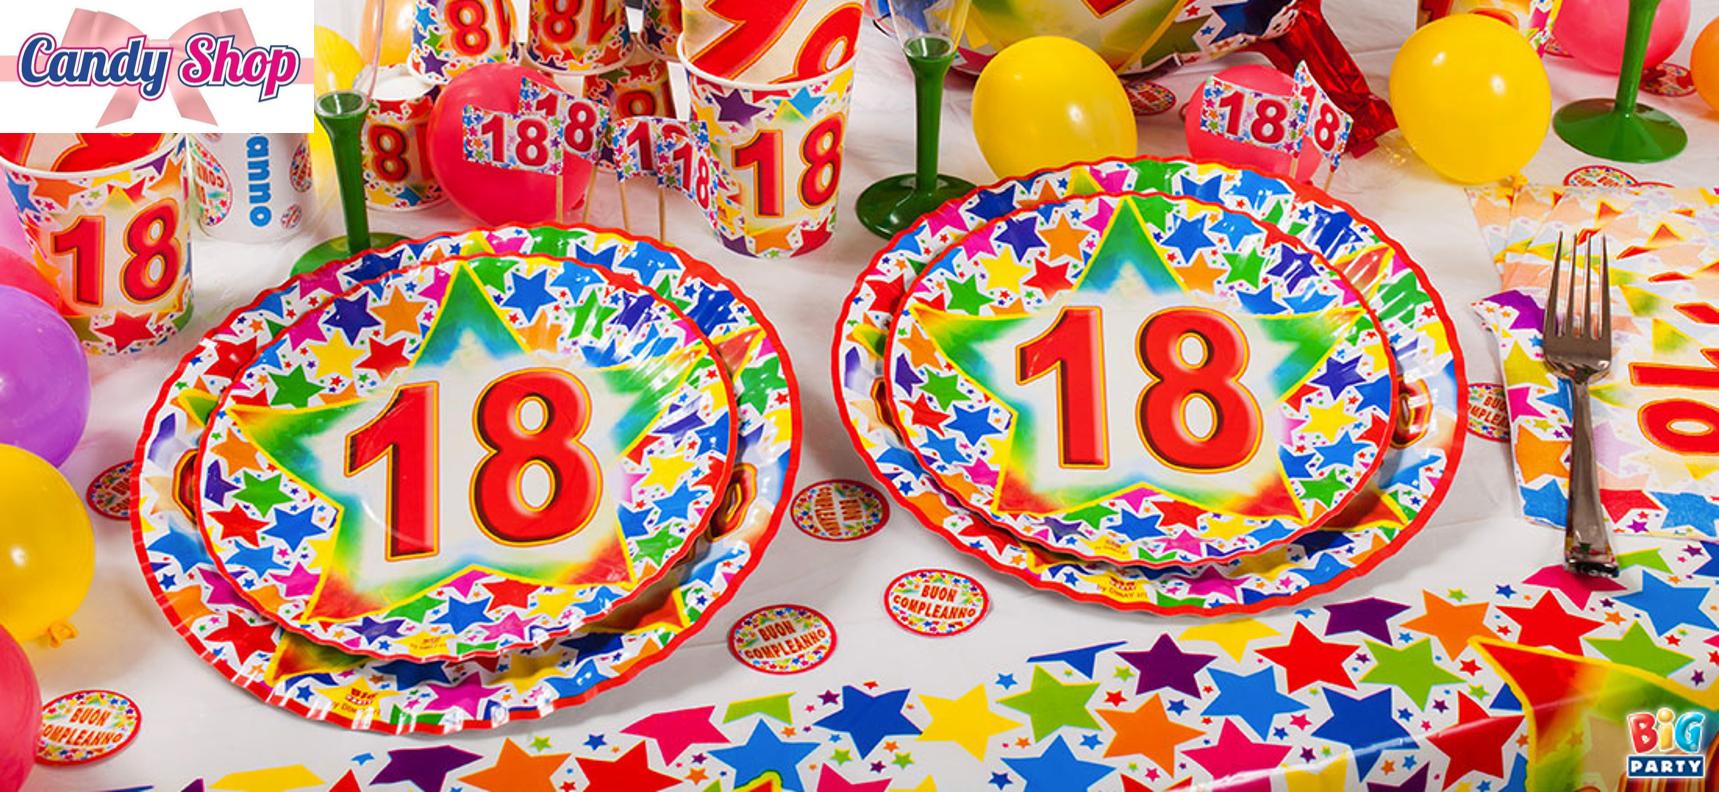 Addobbi per  Party  e feste Candy Shop Torino